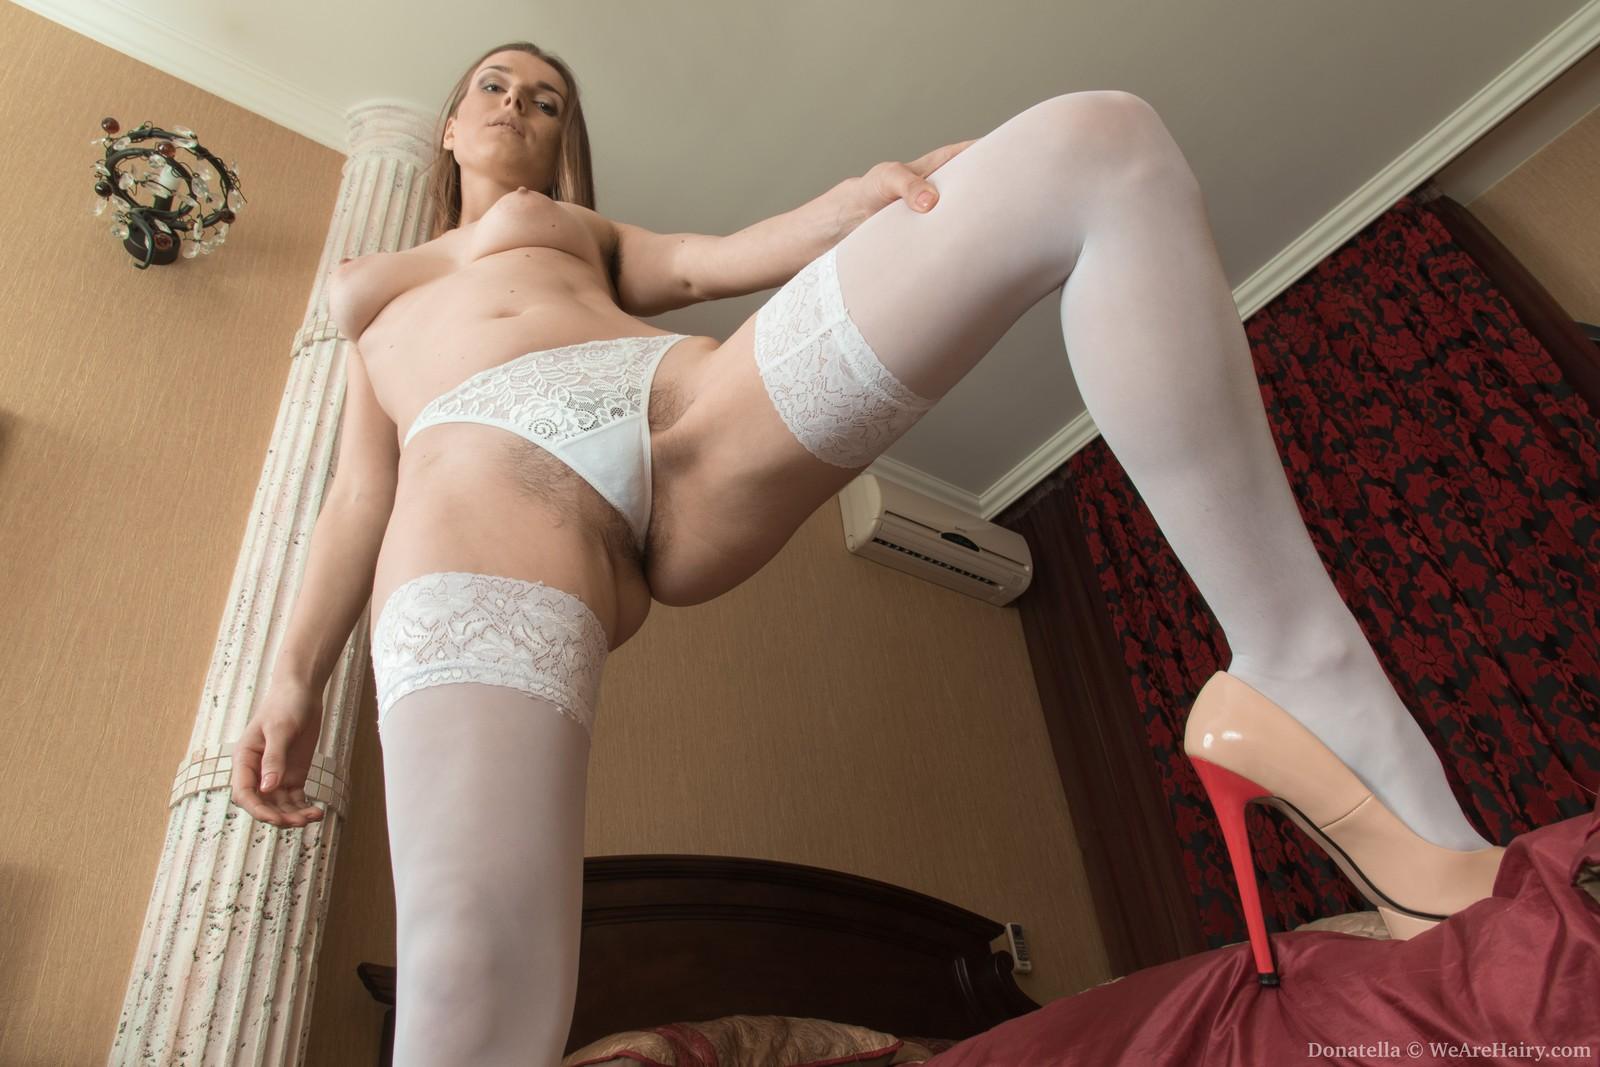 wpid-donatella-models-her-white-stockings-being-sexy6.jpg